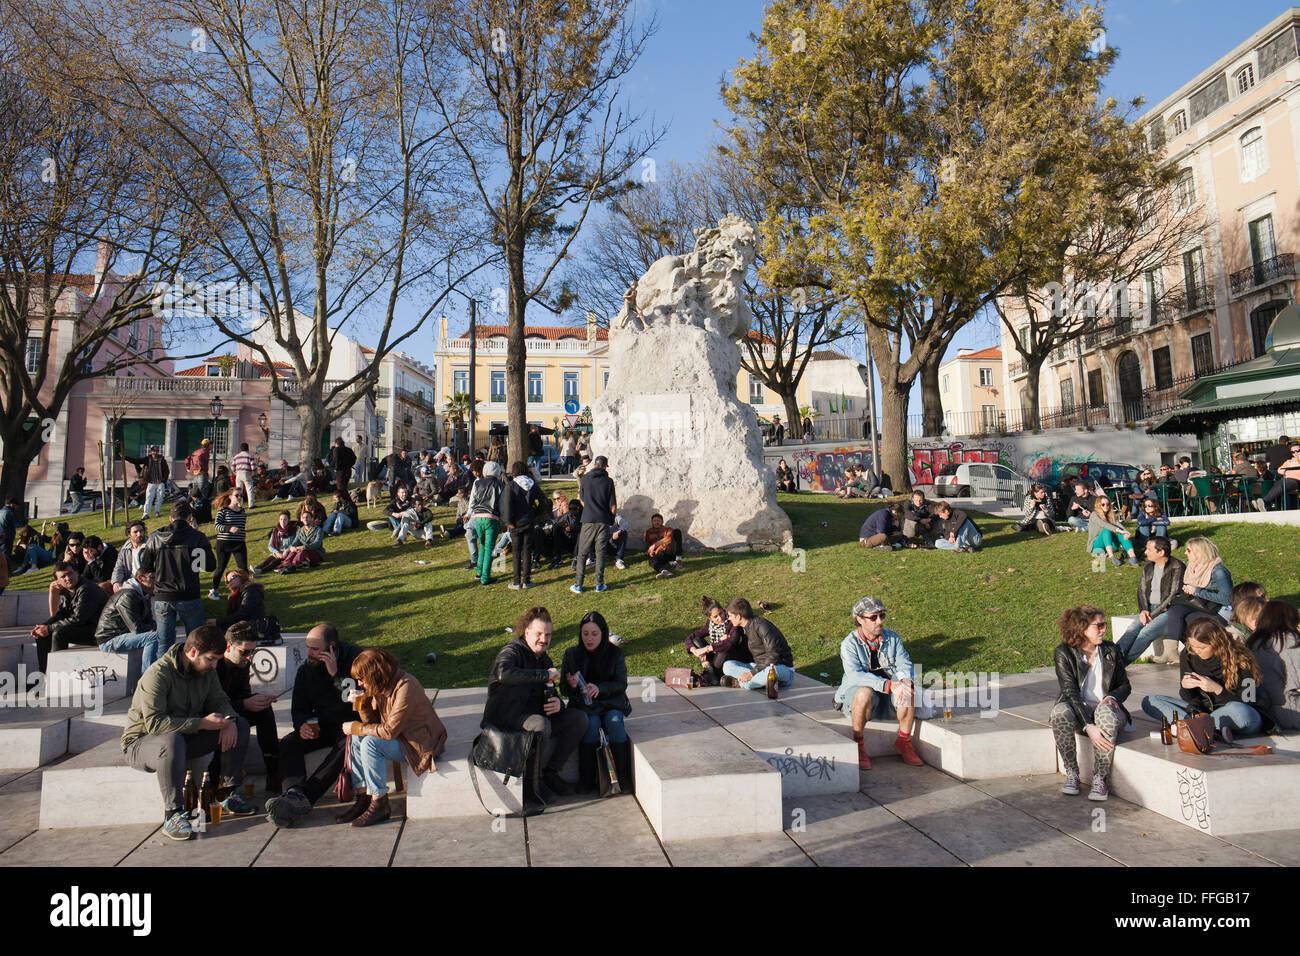 Portugal Lisbon City Life People Relax At Miradouro De